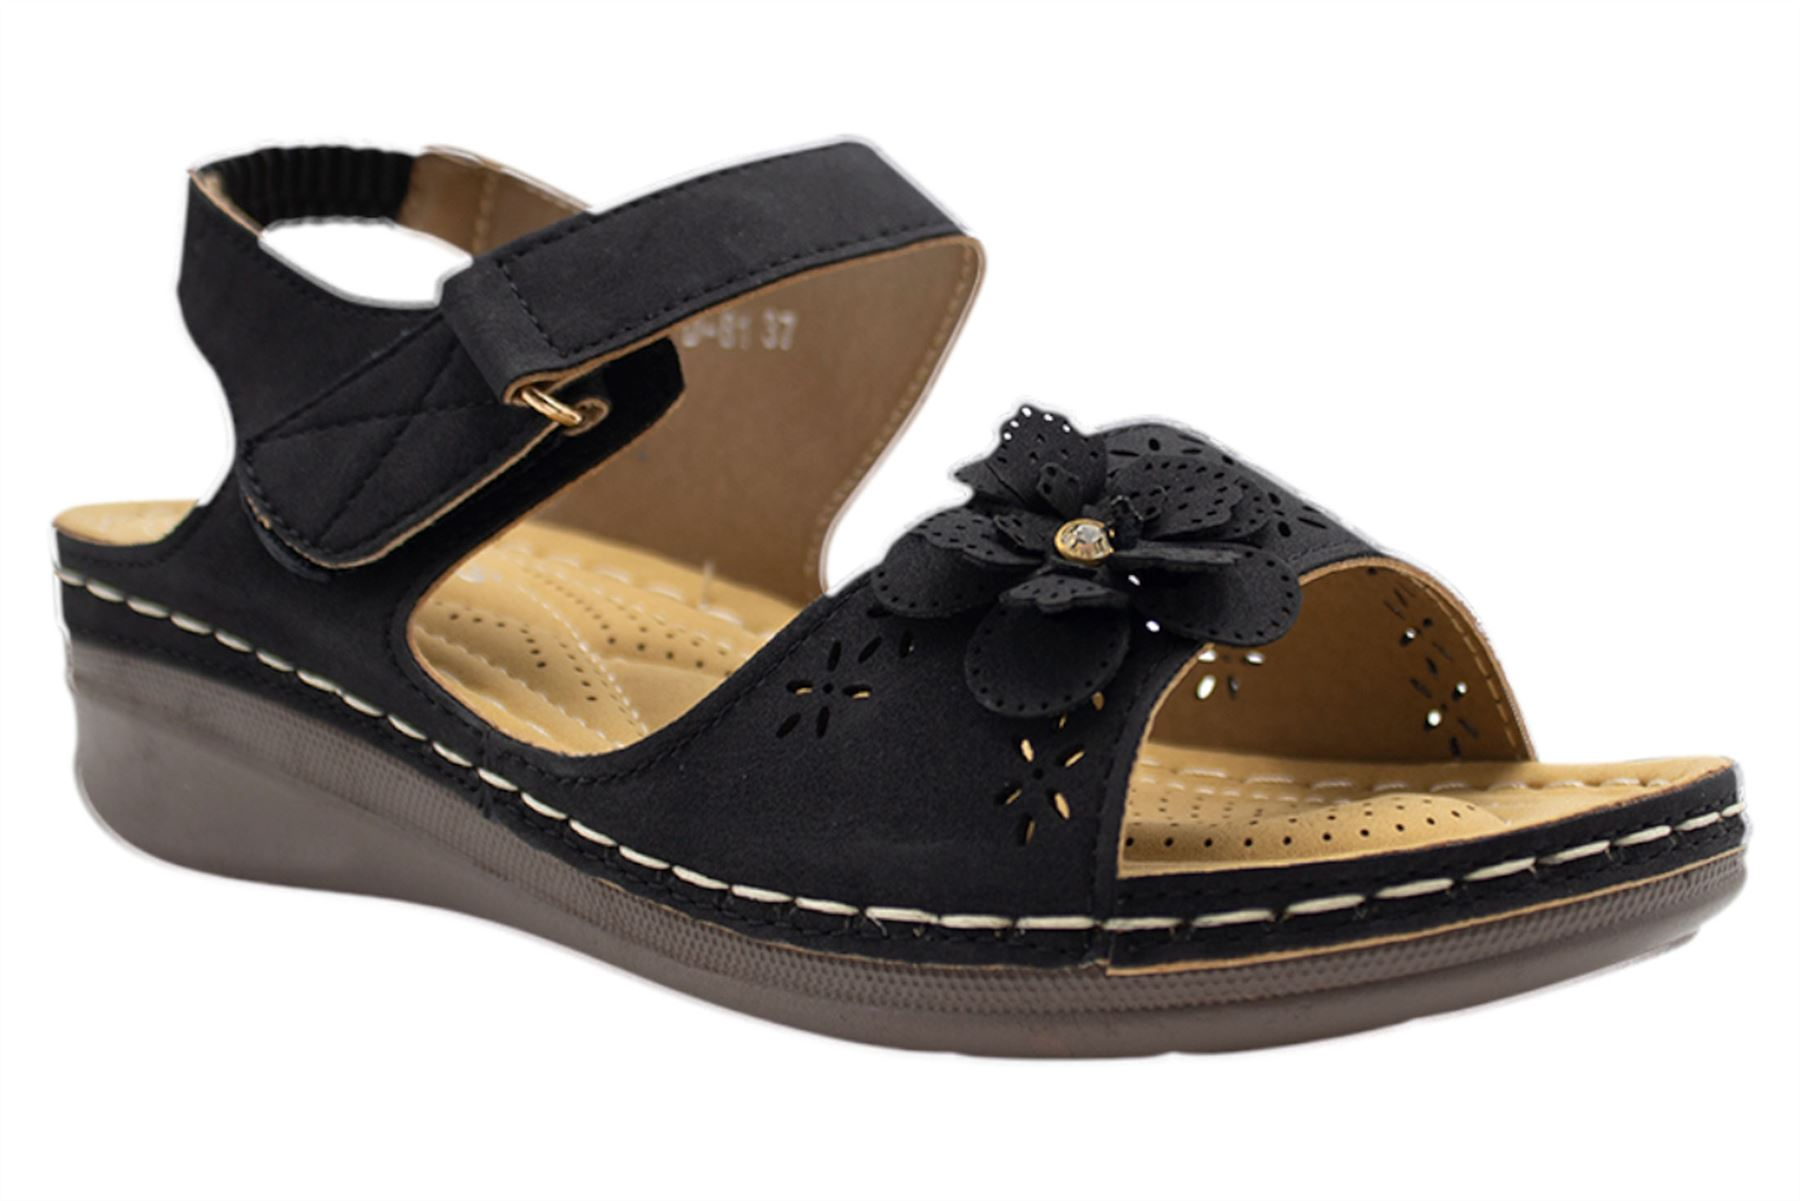 Ladies-Sandals-Womens-Mid-Heel-Comfort-Summer-Beach-Casual-Wear miniatura 20